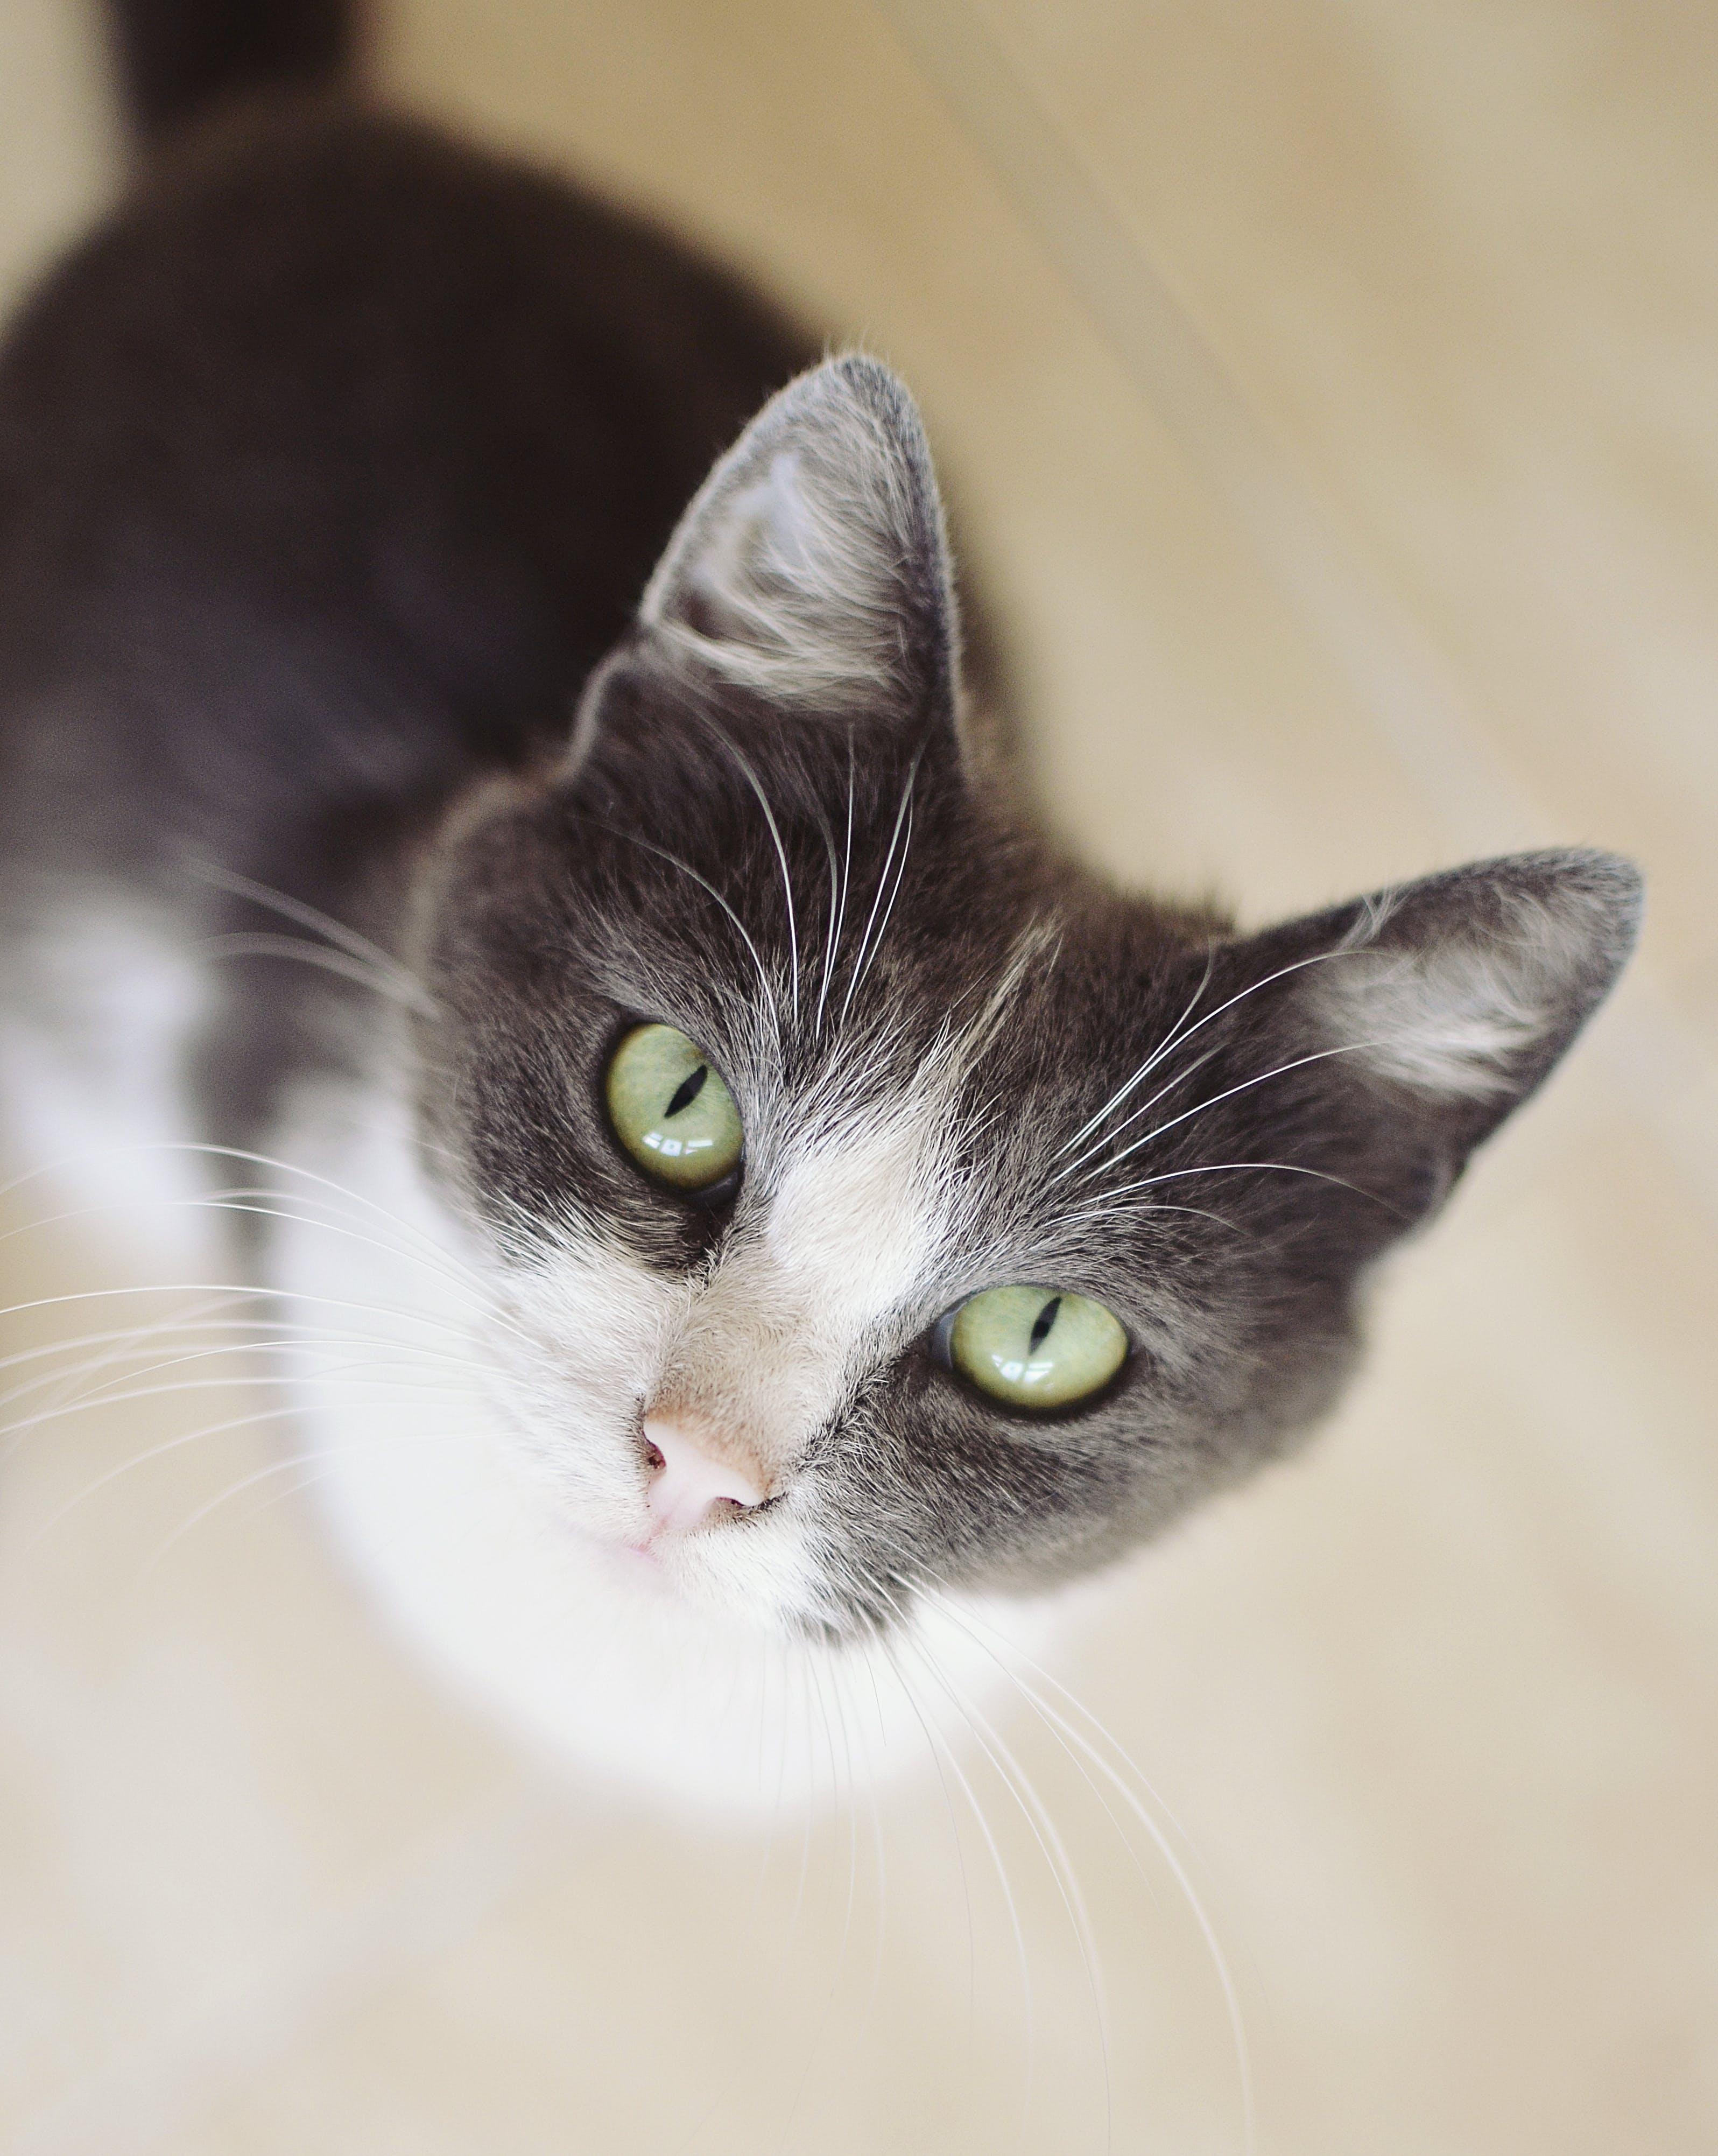 Free stock photo of cat, looking up, green eyes, headshot